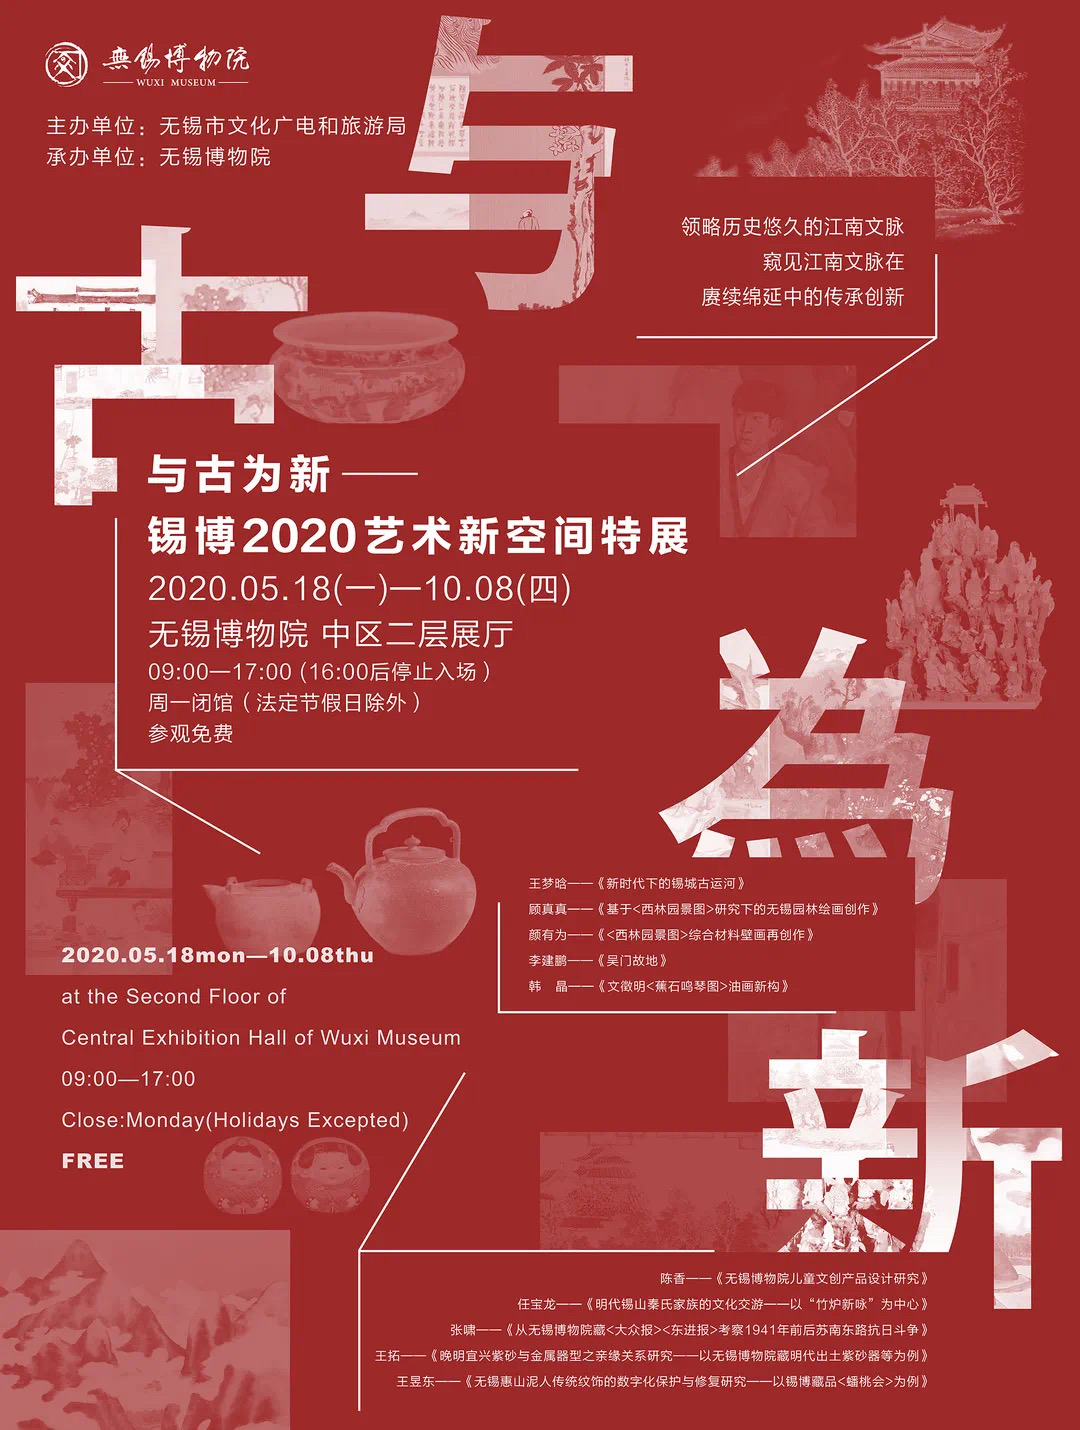 IMG_3003(20200514-161918).JPG